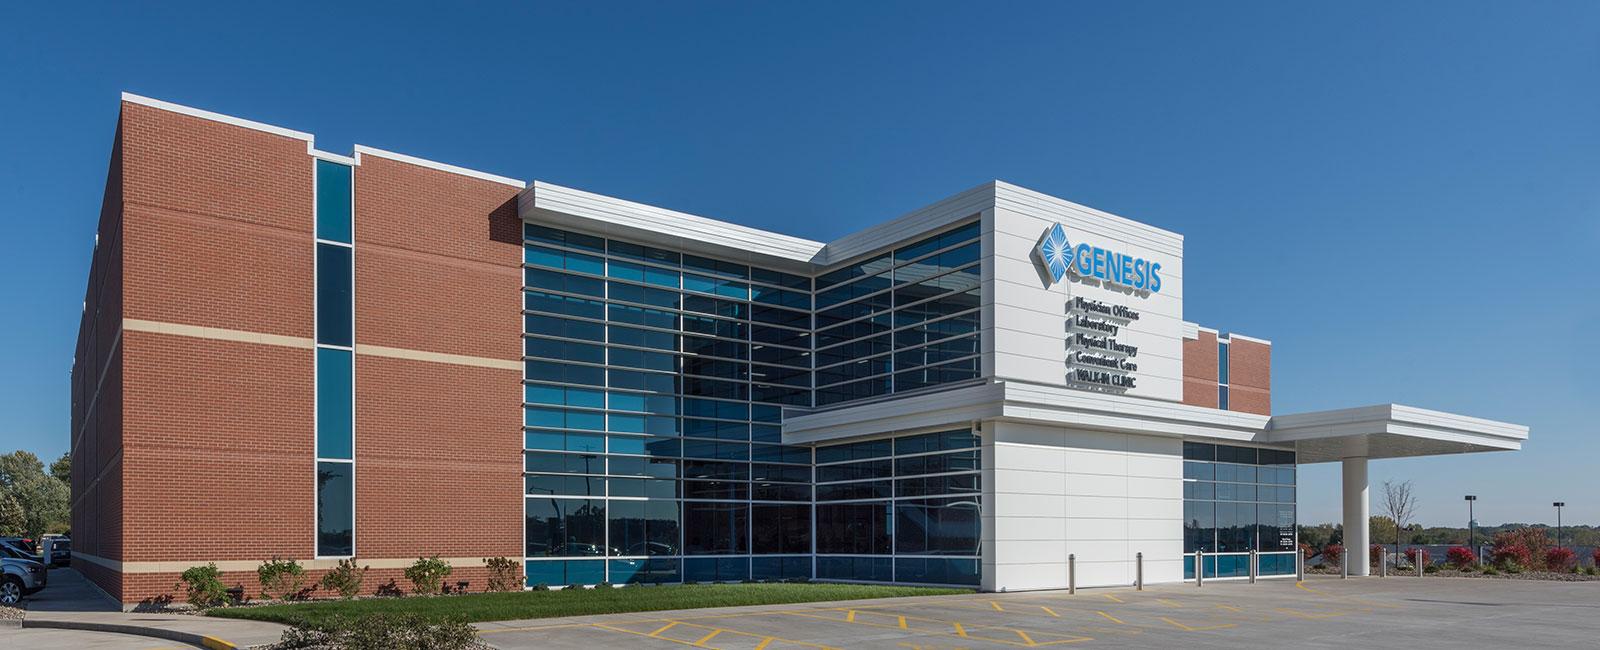 Davenport Genesis HealthPlex